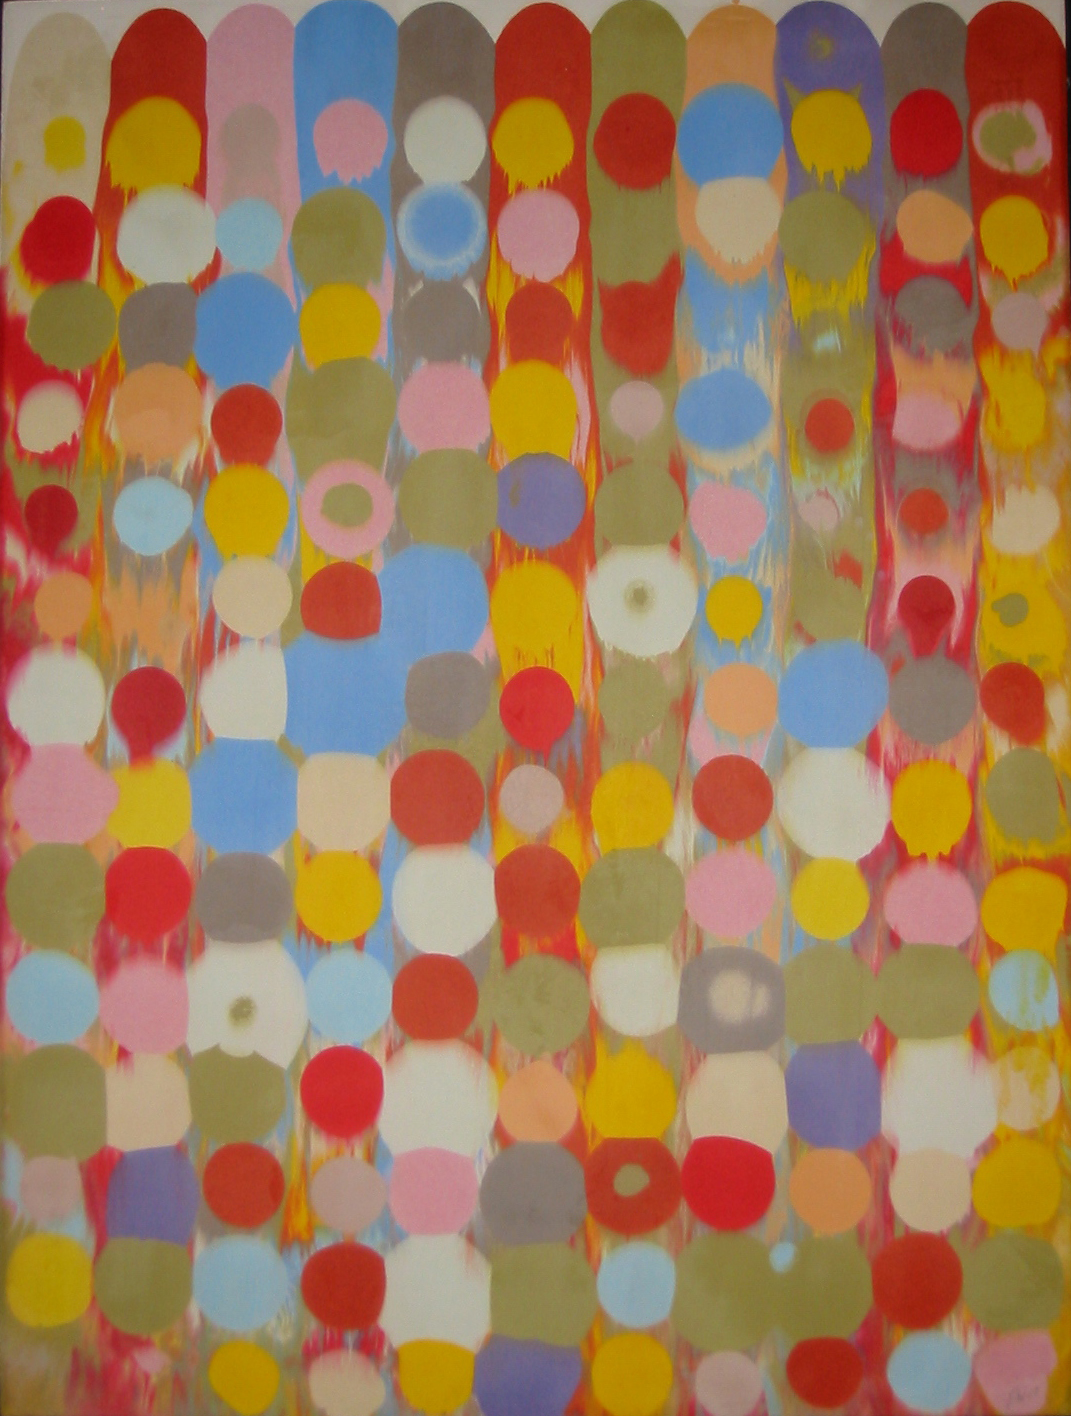 Point Array, Series I, No. 12